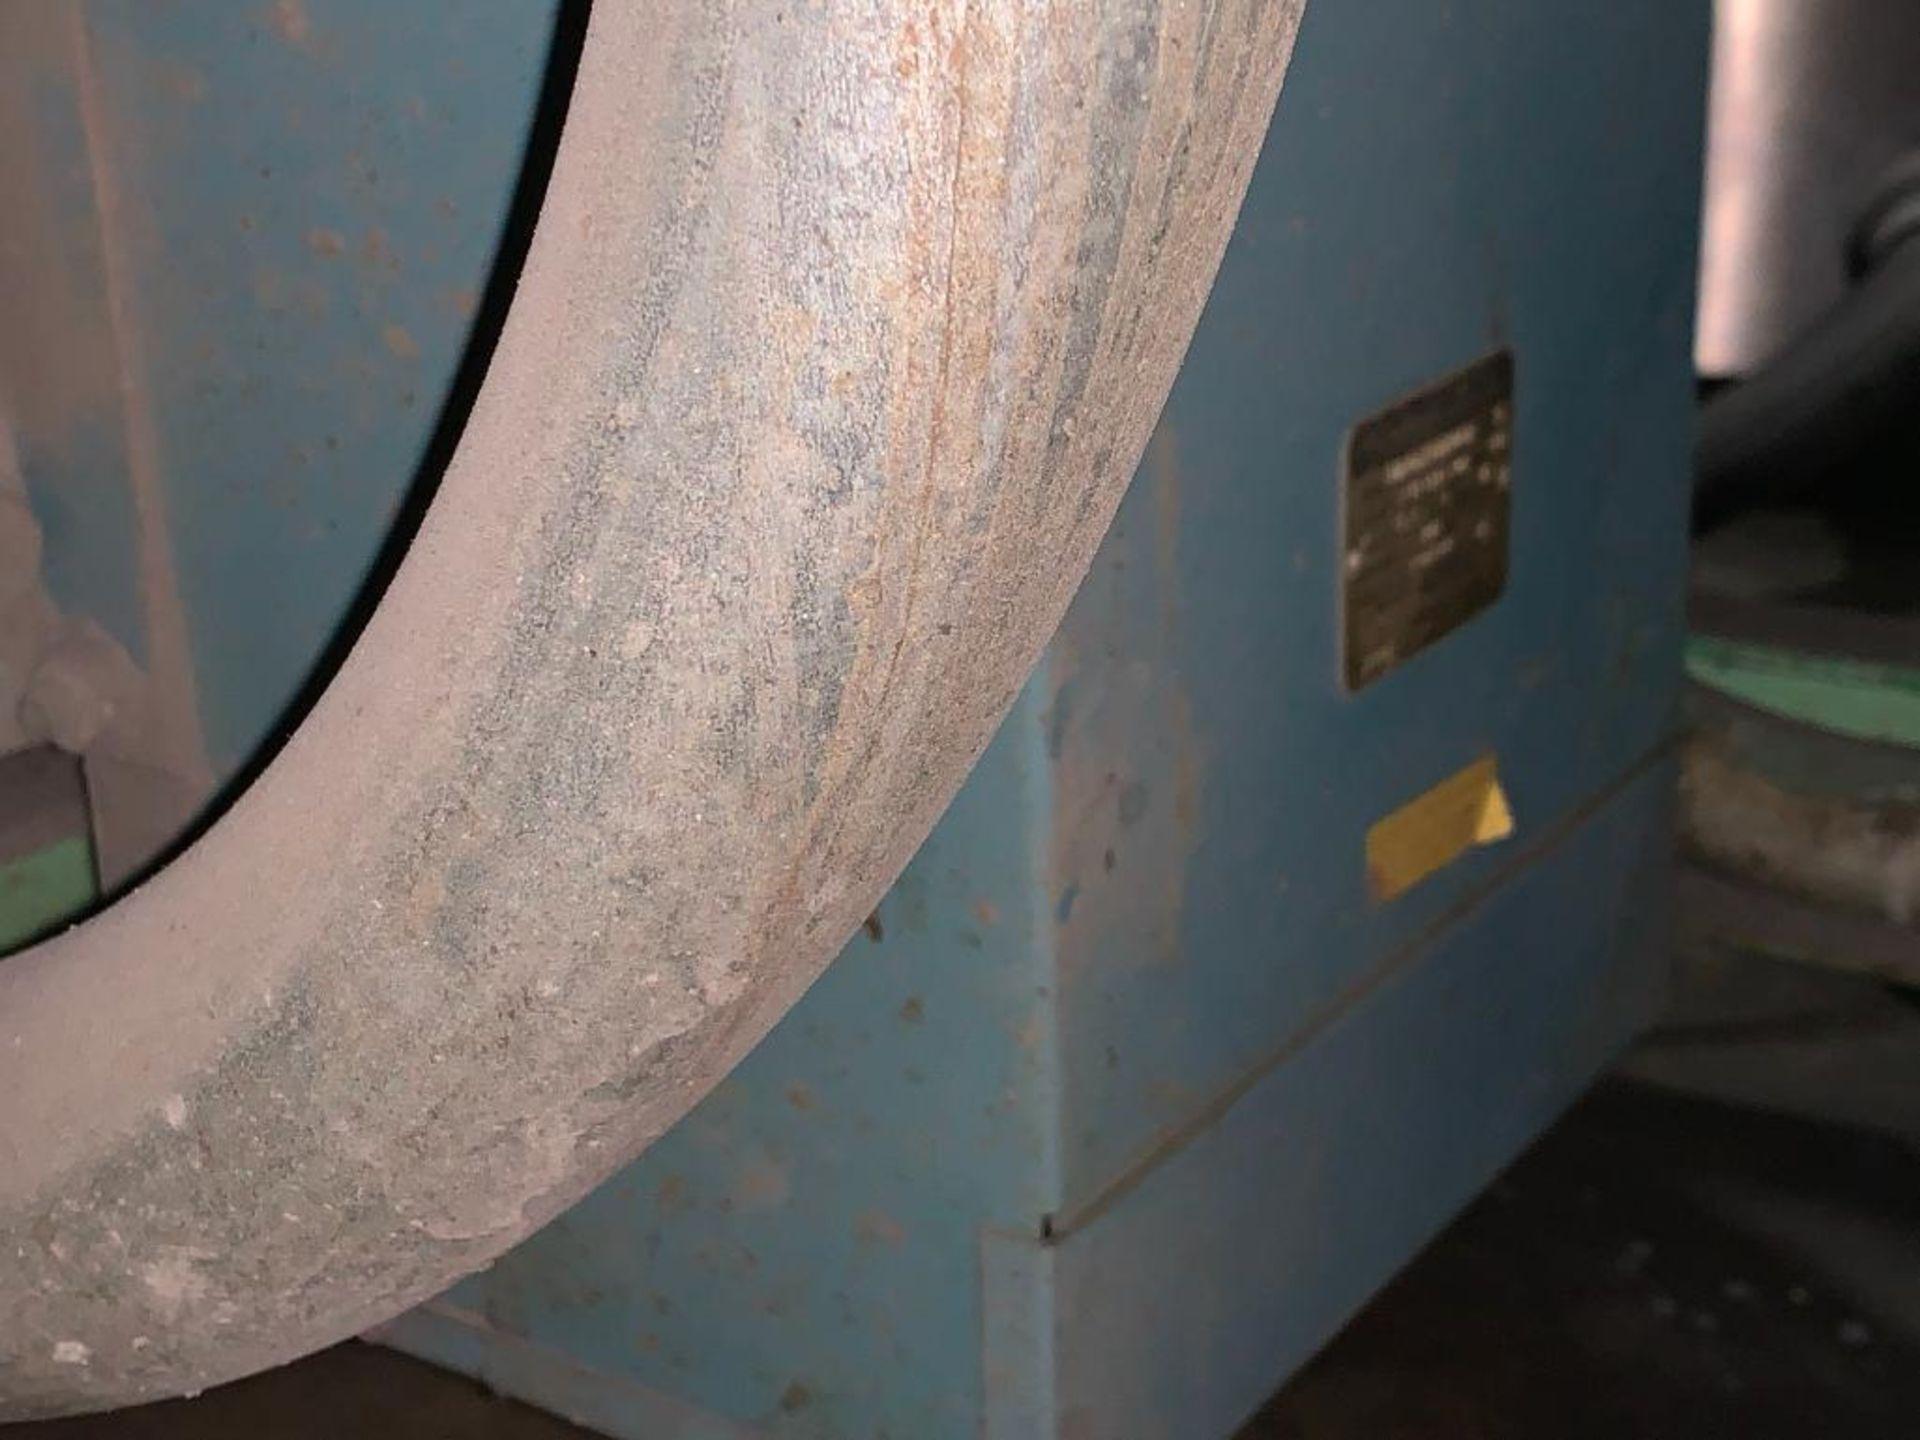 1978 Clybourn carton erecting filling closing machine - Image 40 of 68